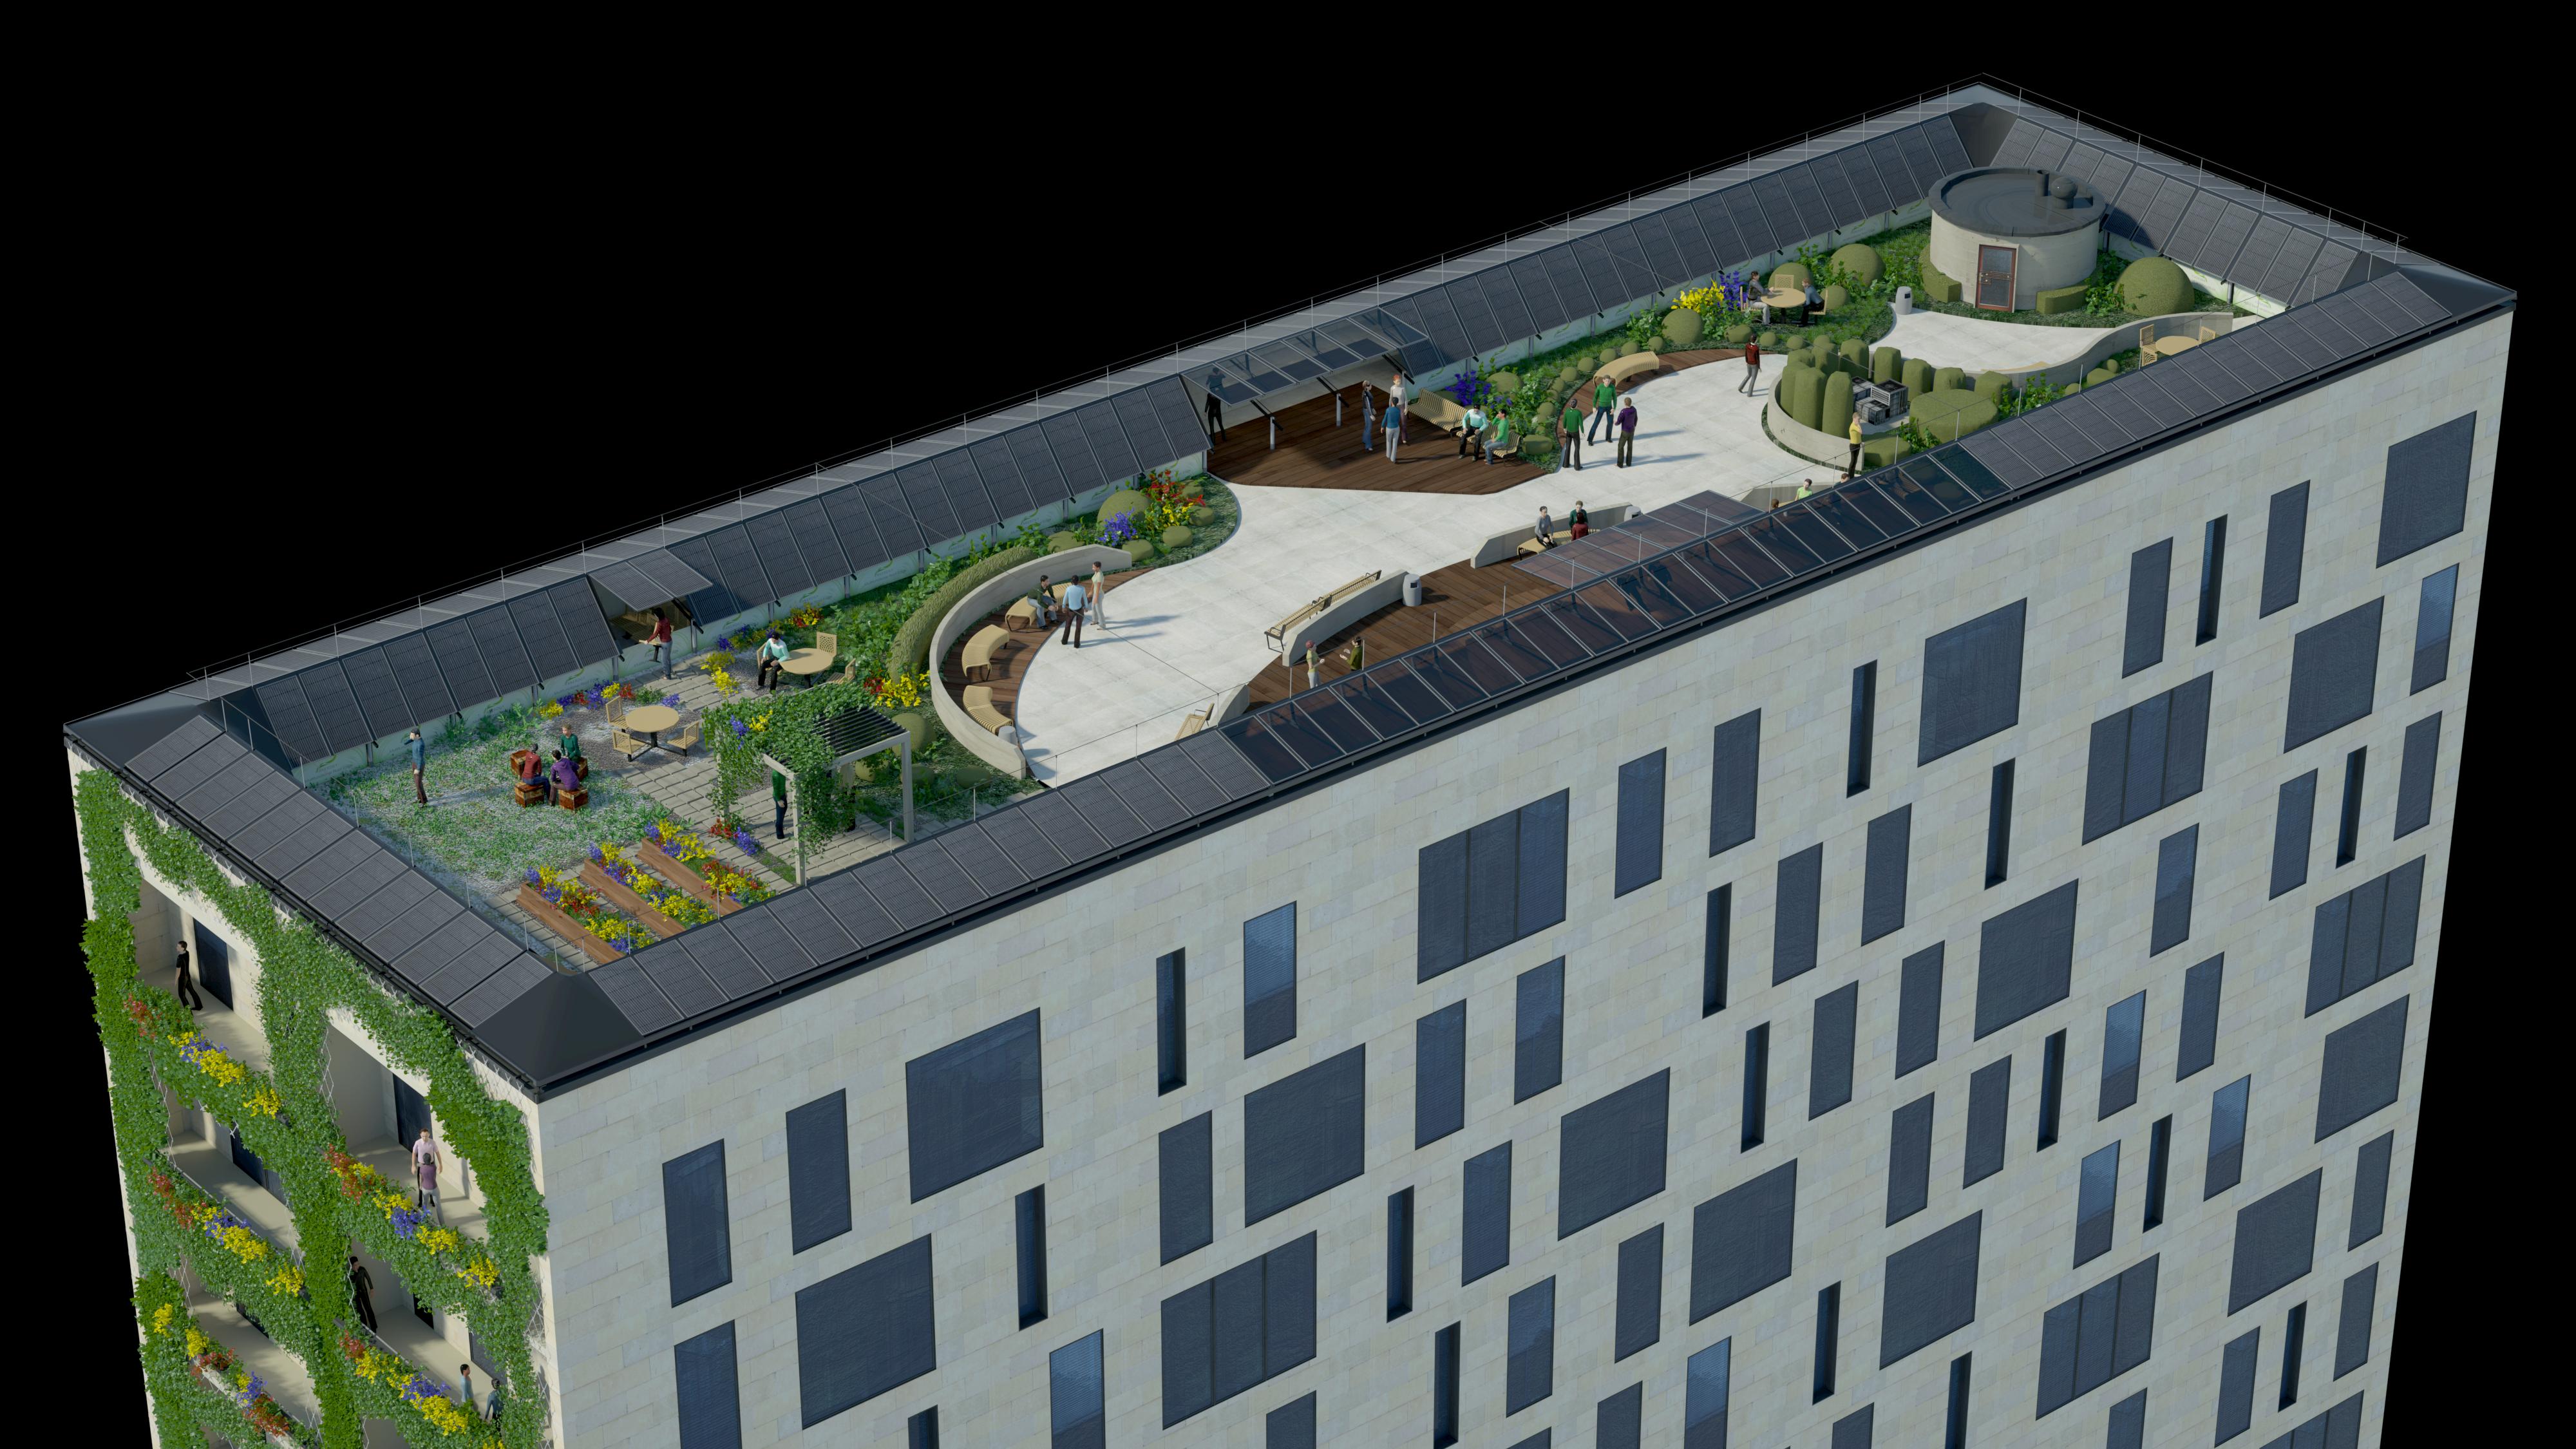 Gallery Multifunctional Roof Edge (MRE) 2